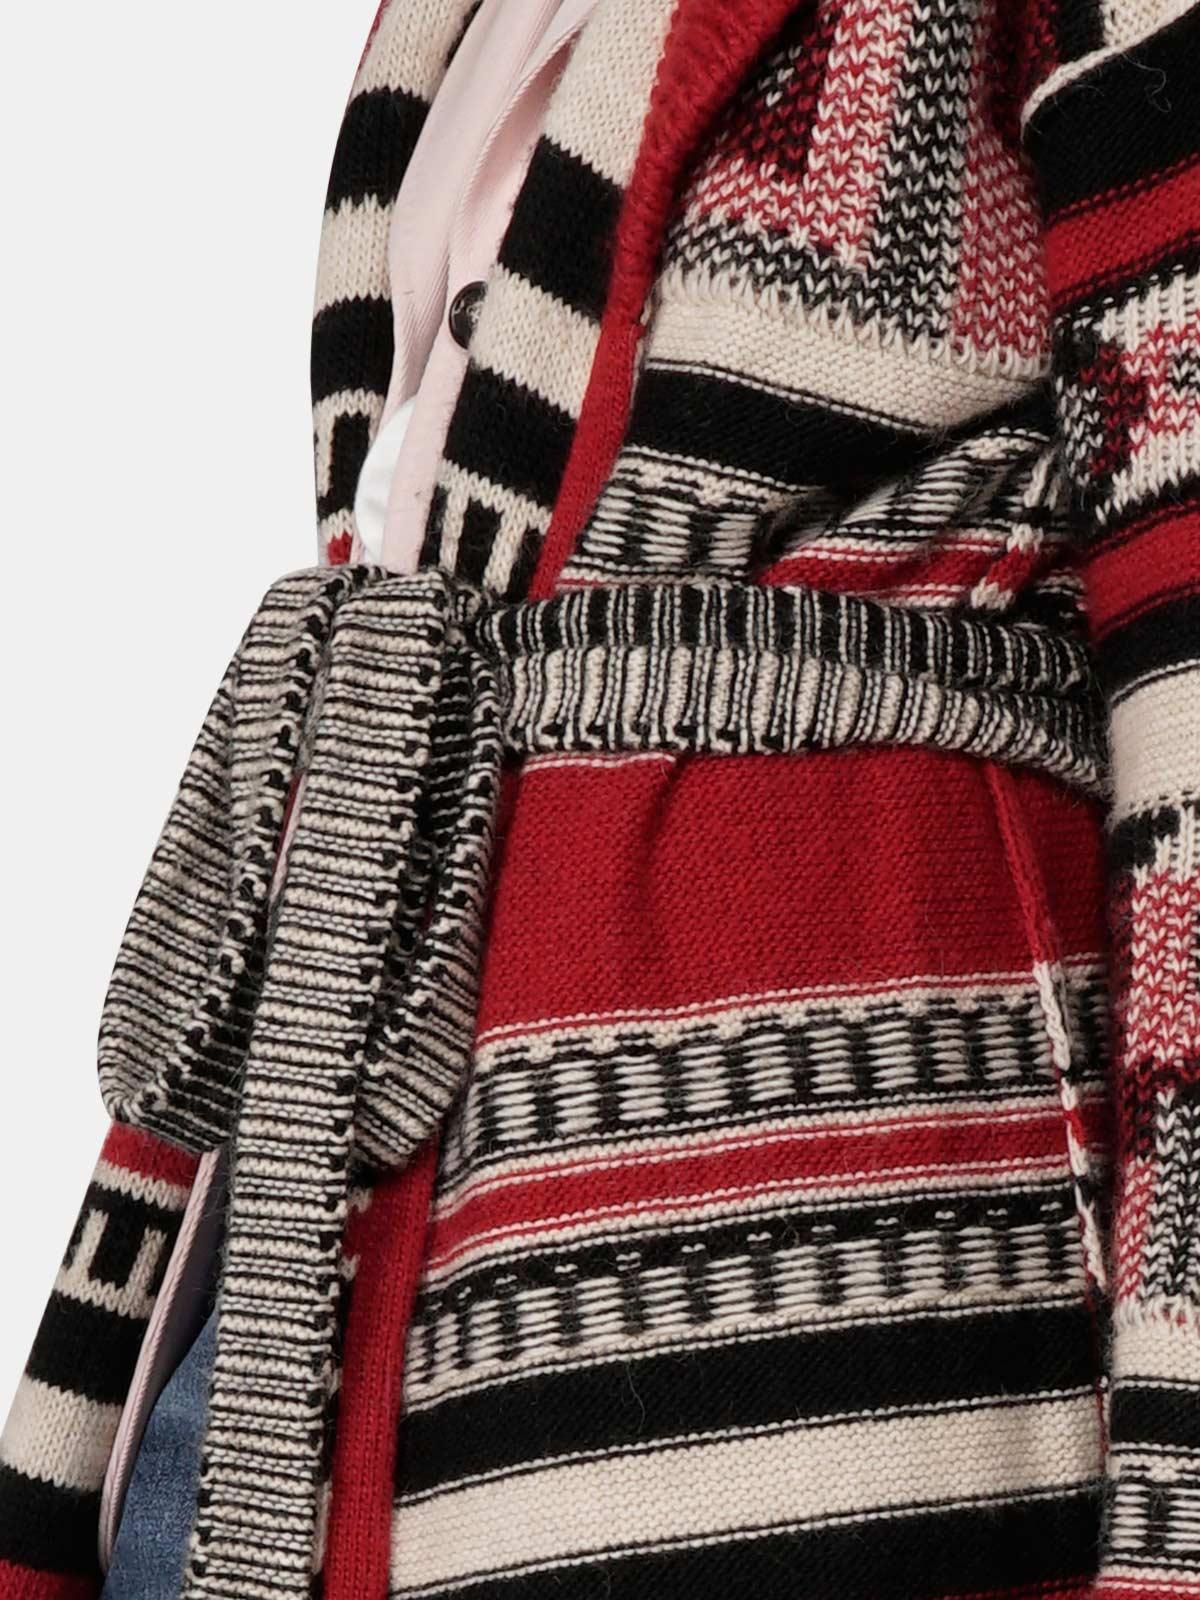 Golden Goose - Azul cardigan in jacquard pattern wool blend in